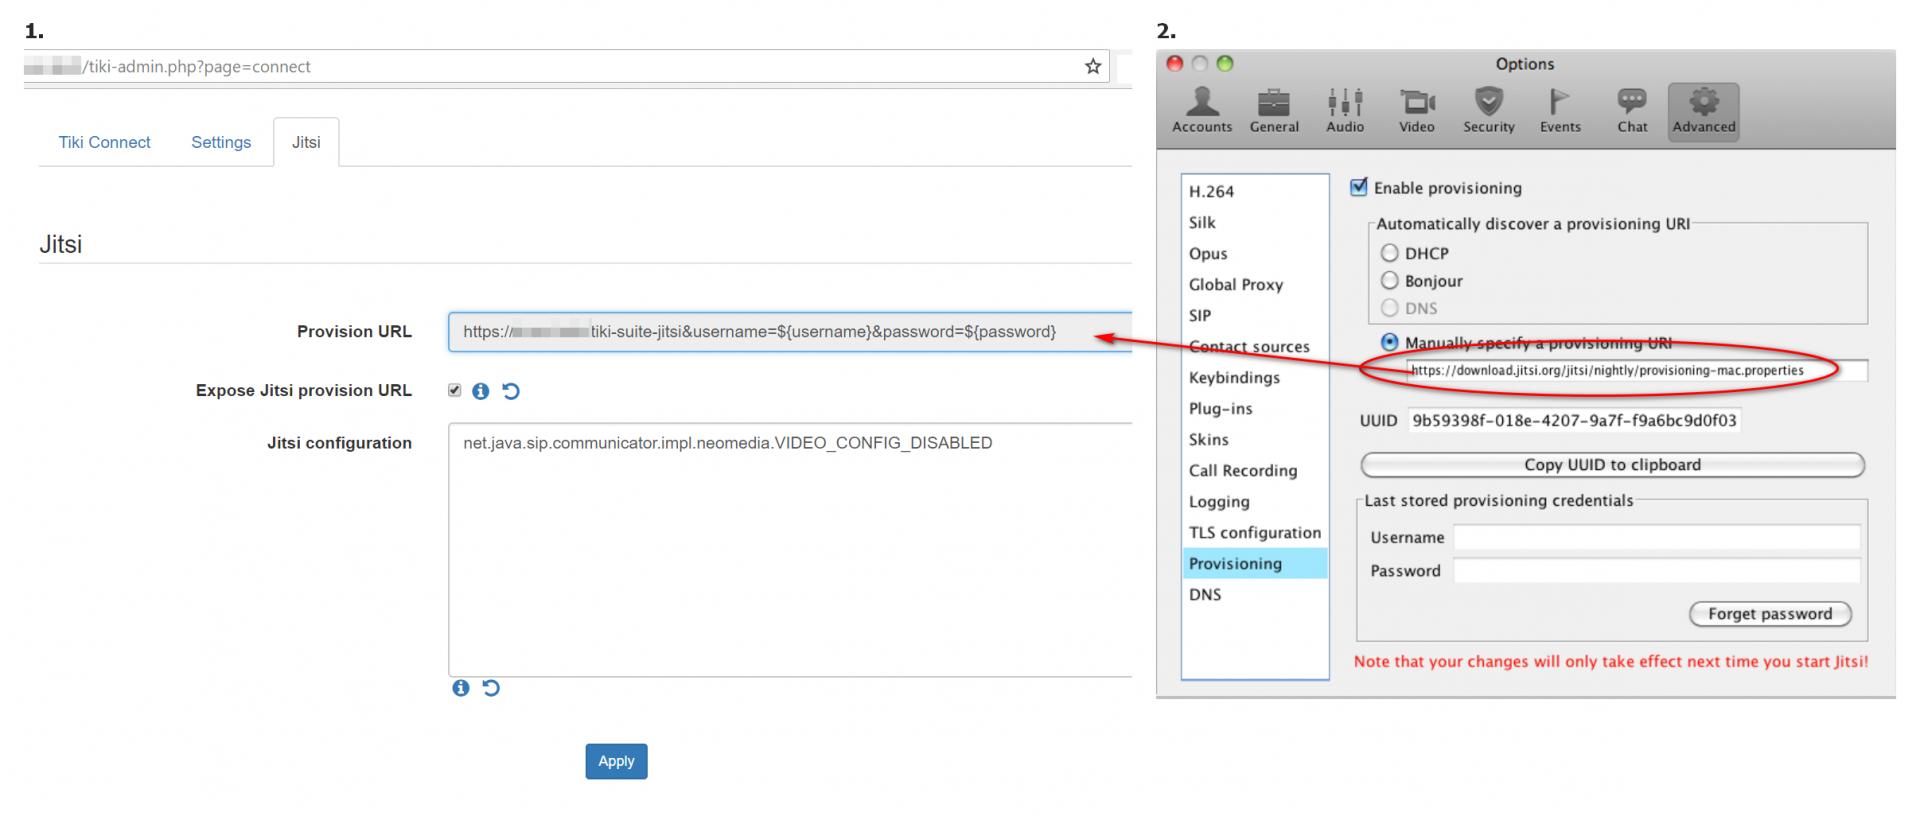 Jitsi   Documentation for Tiki Wiki CMS Groupware